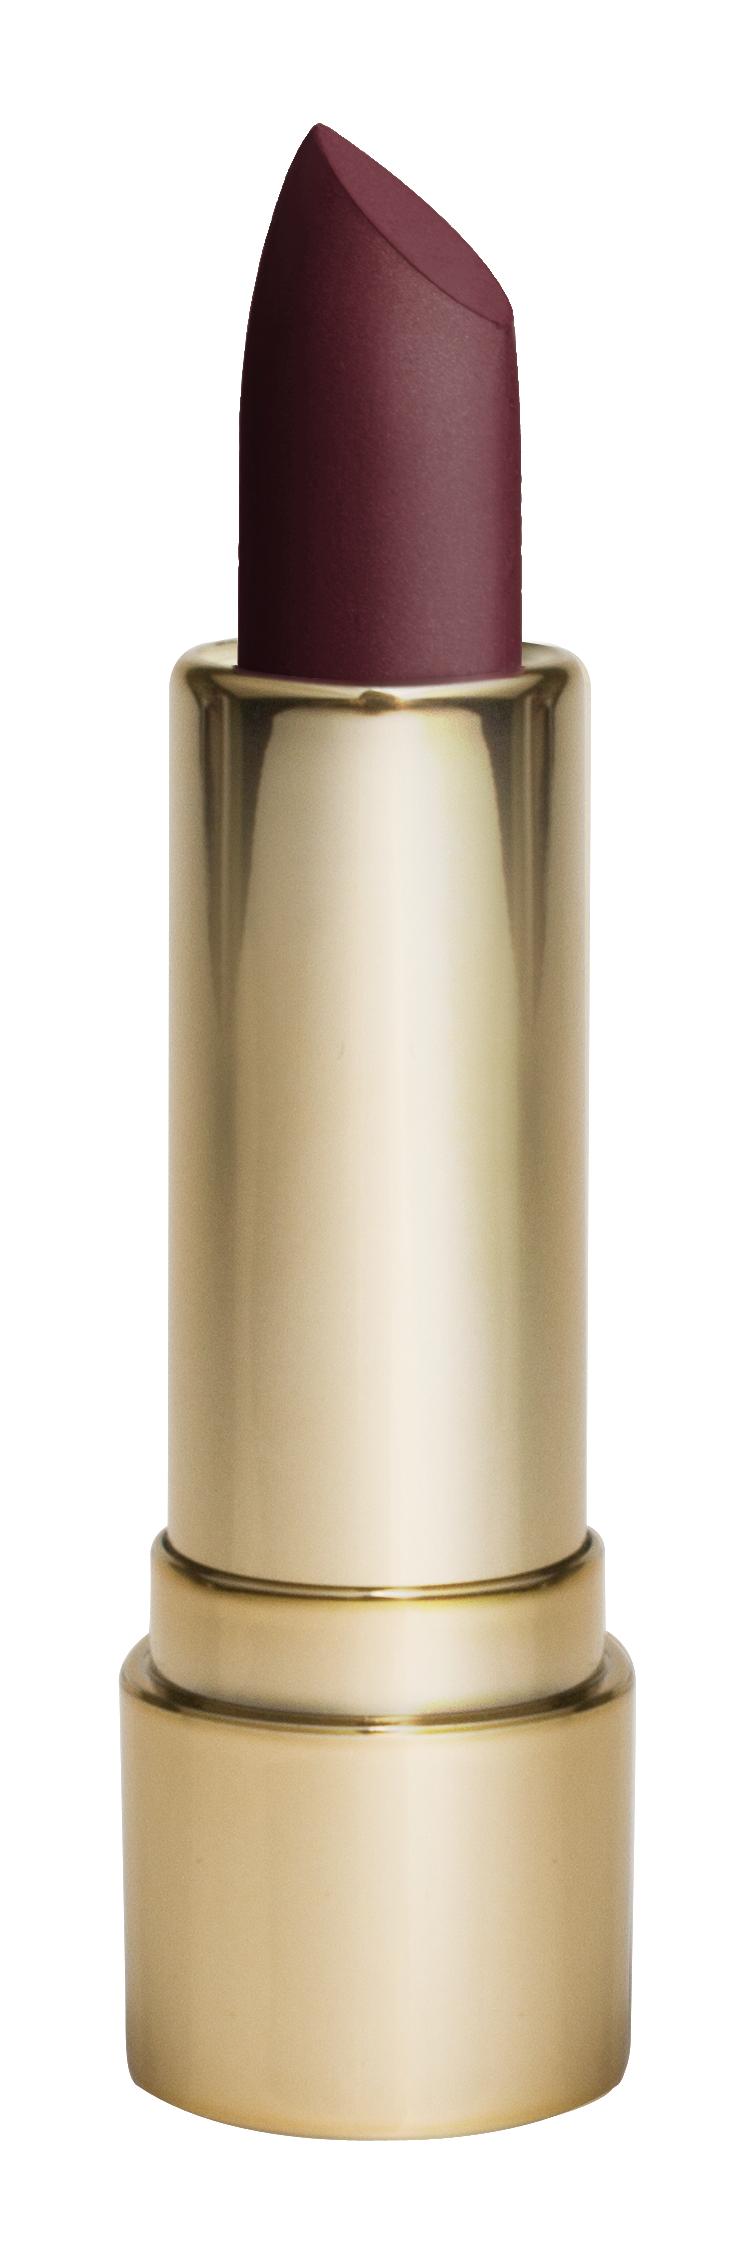 Hean Luxury Cashmere rtěnka Matt č.710 burgundy 4.5g